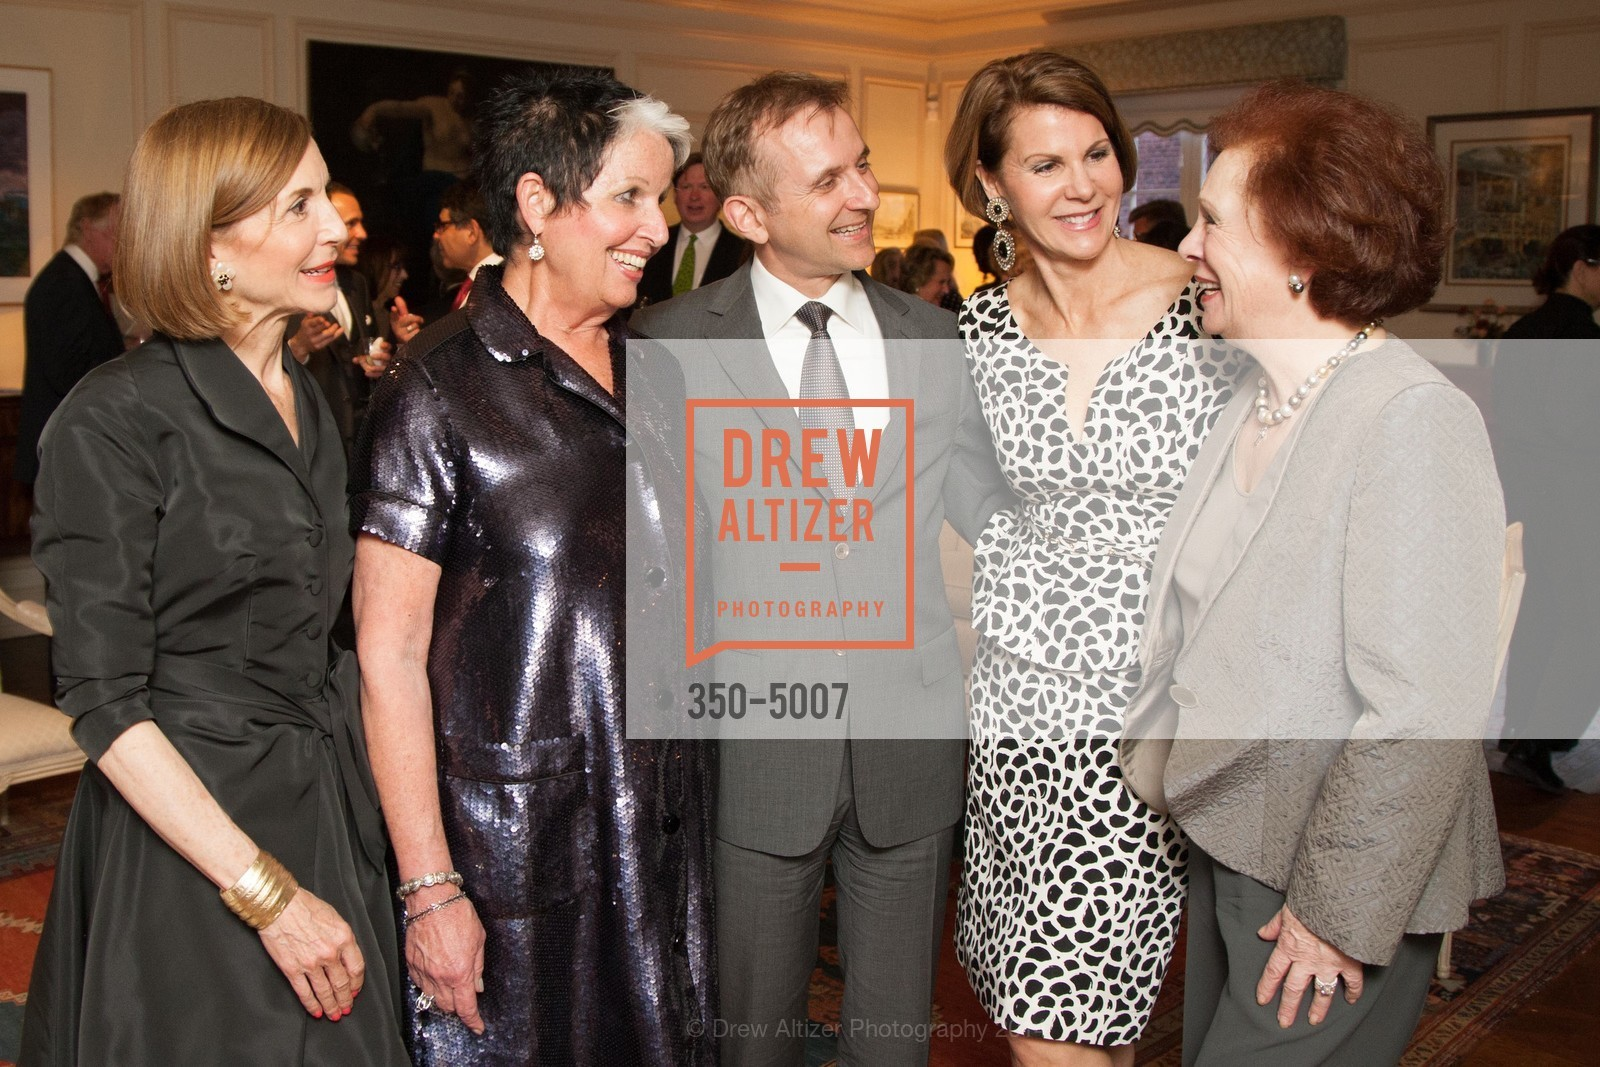 Marsha Monro, Karen Kubin, Mauro Battocchi, Katie Jarman, Romana Bracco, Photo #350-5007